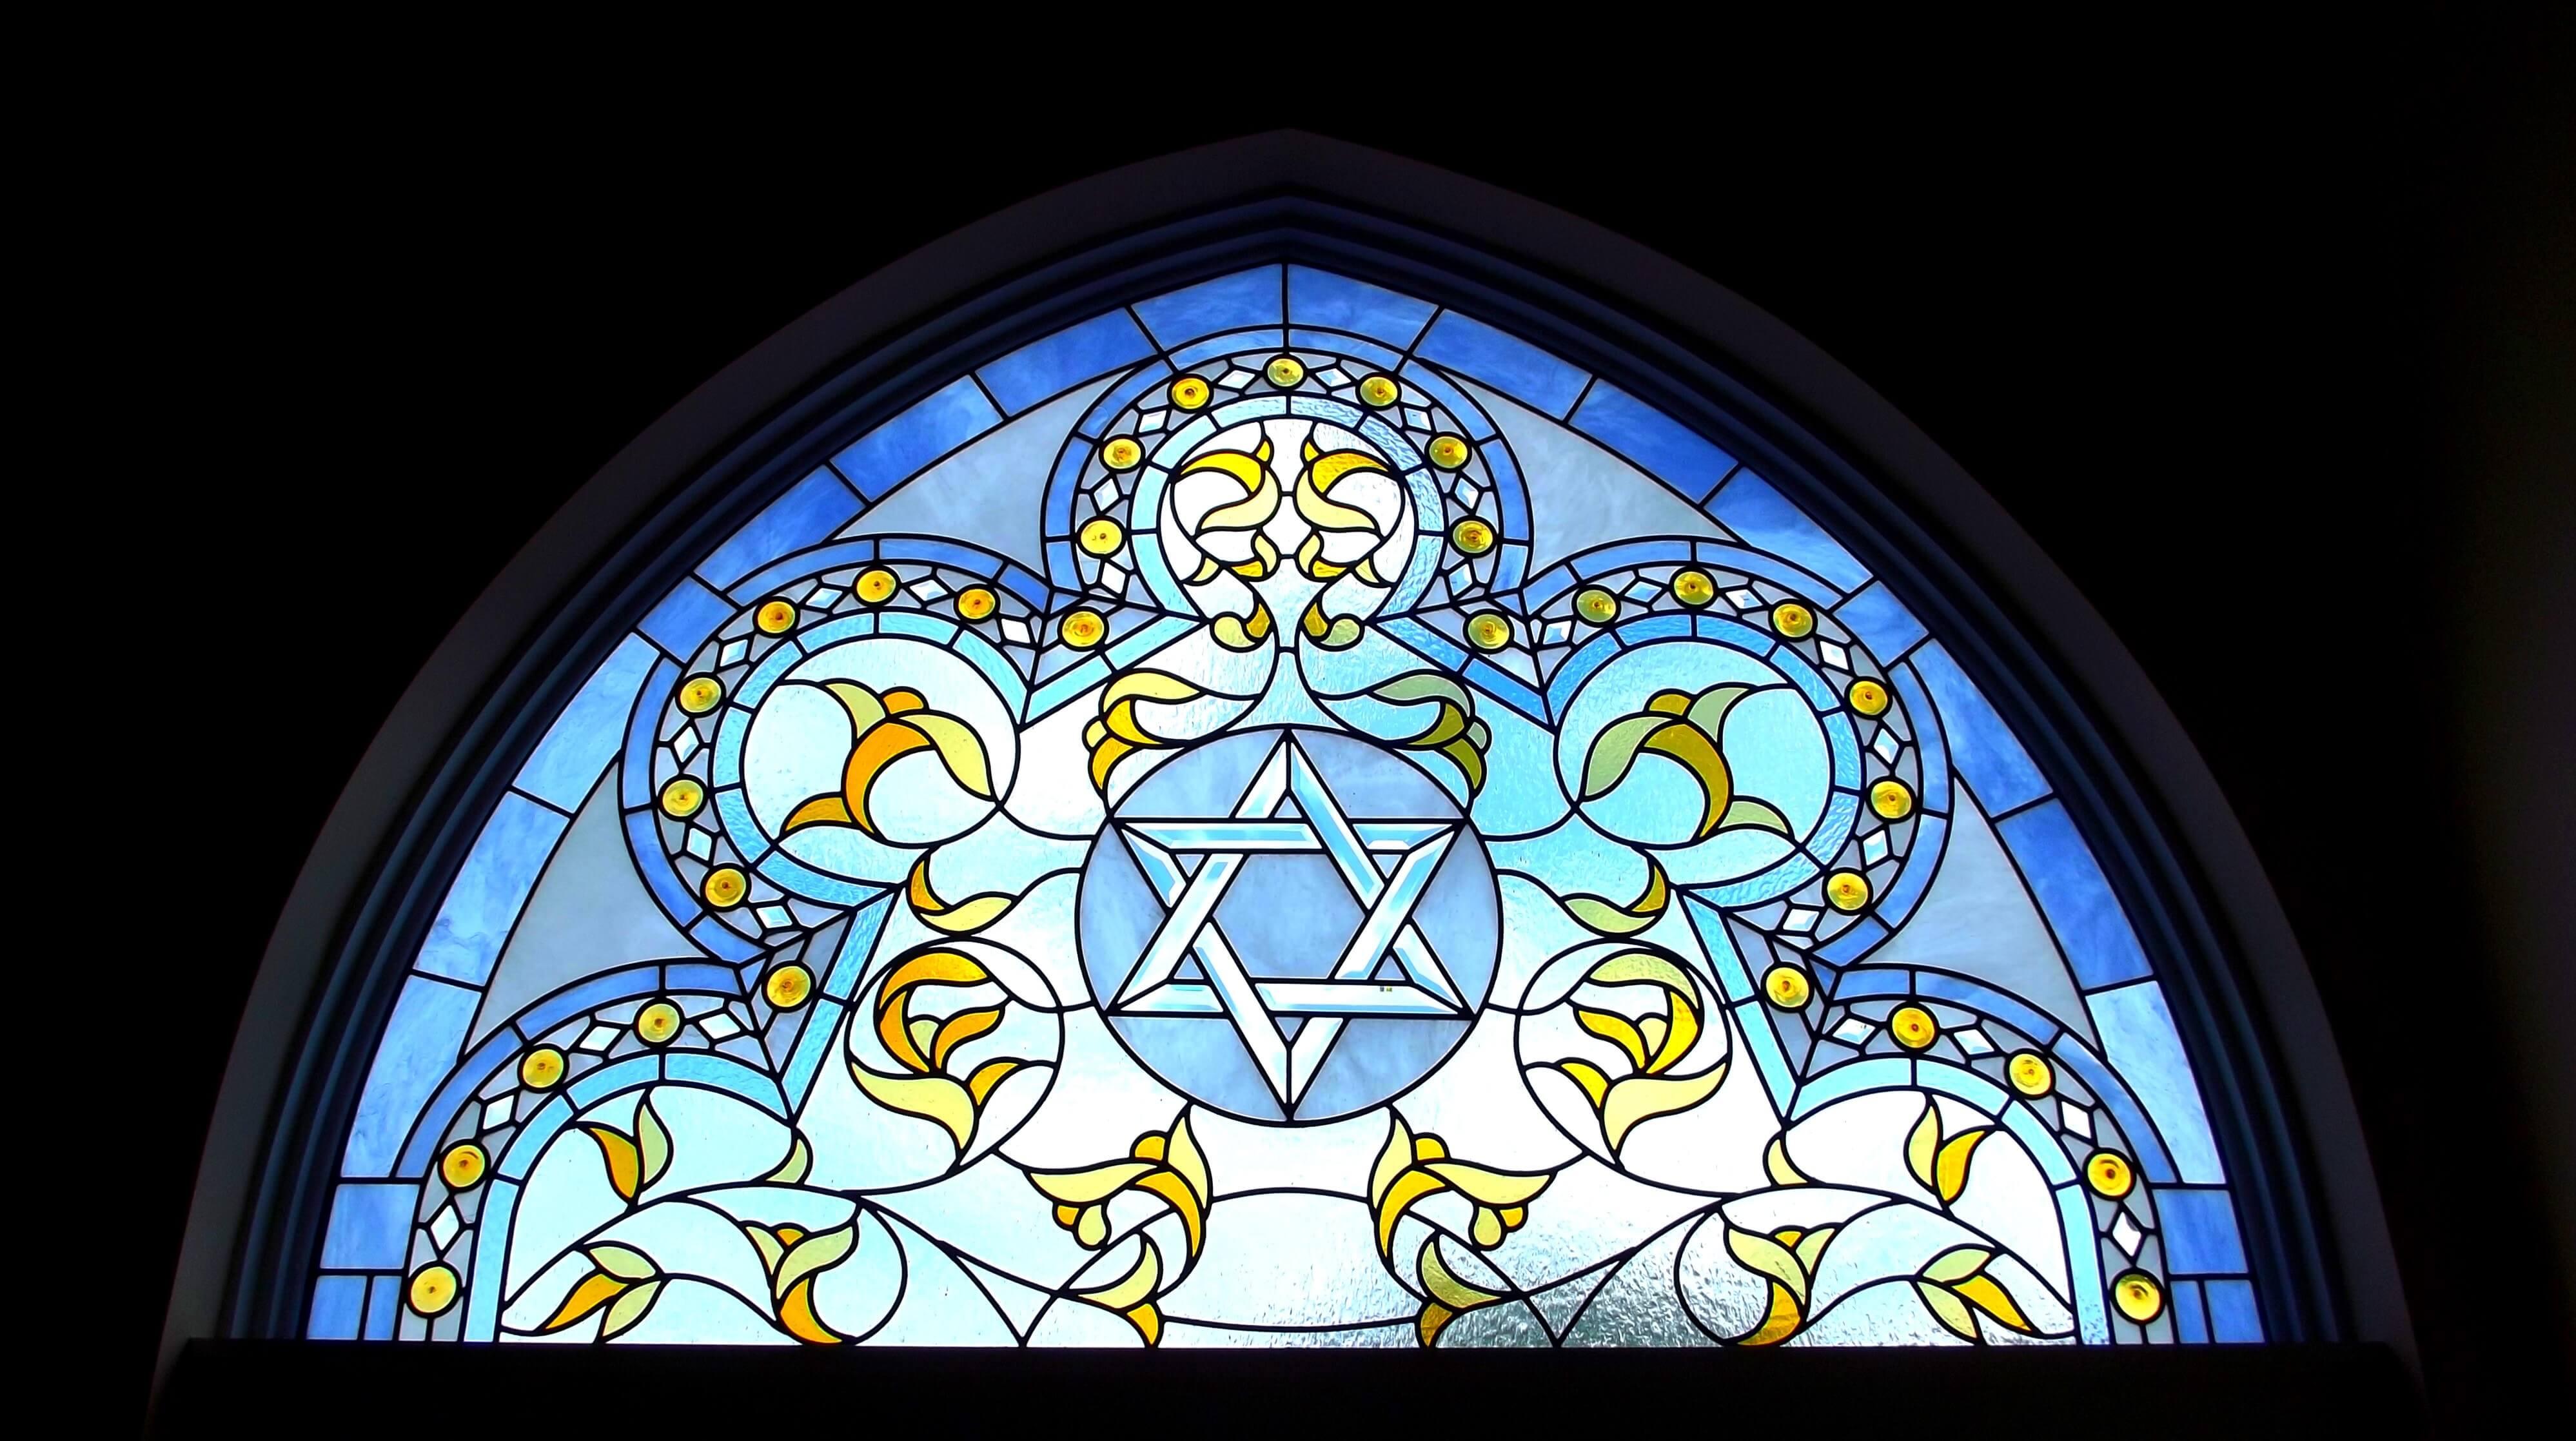 Stichting AP steunt online petitie tegen antisemitisme